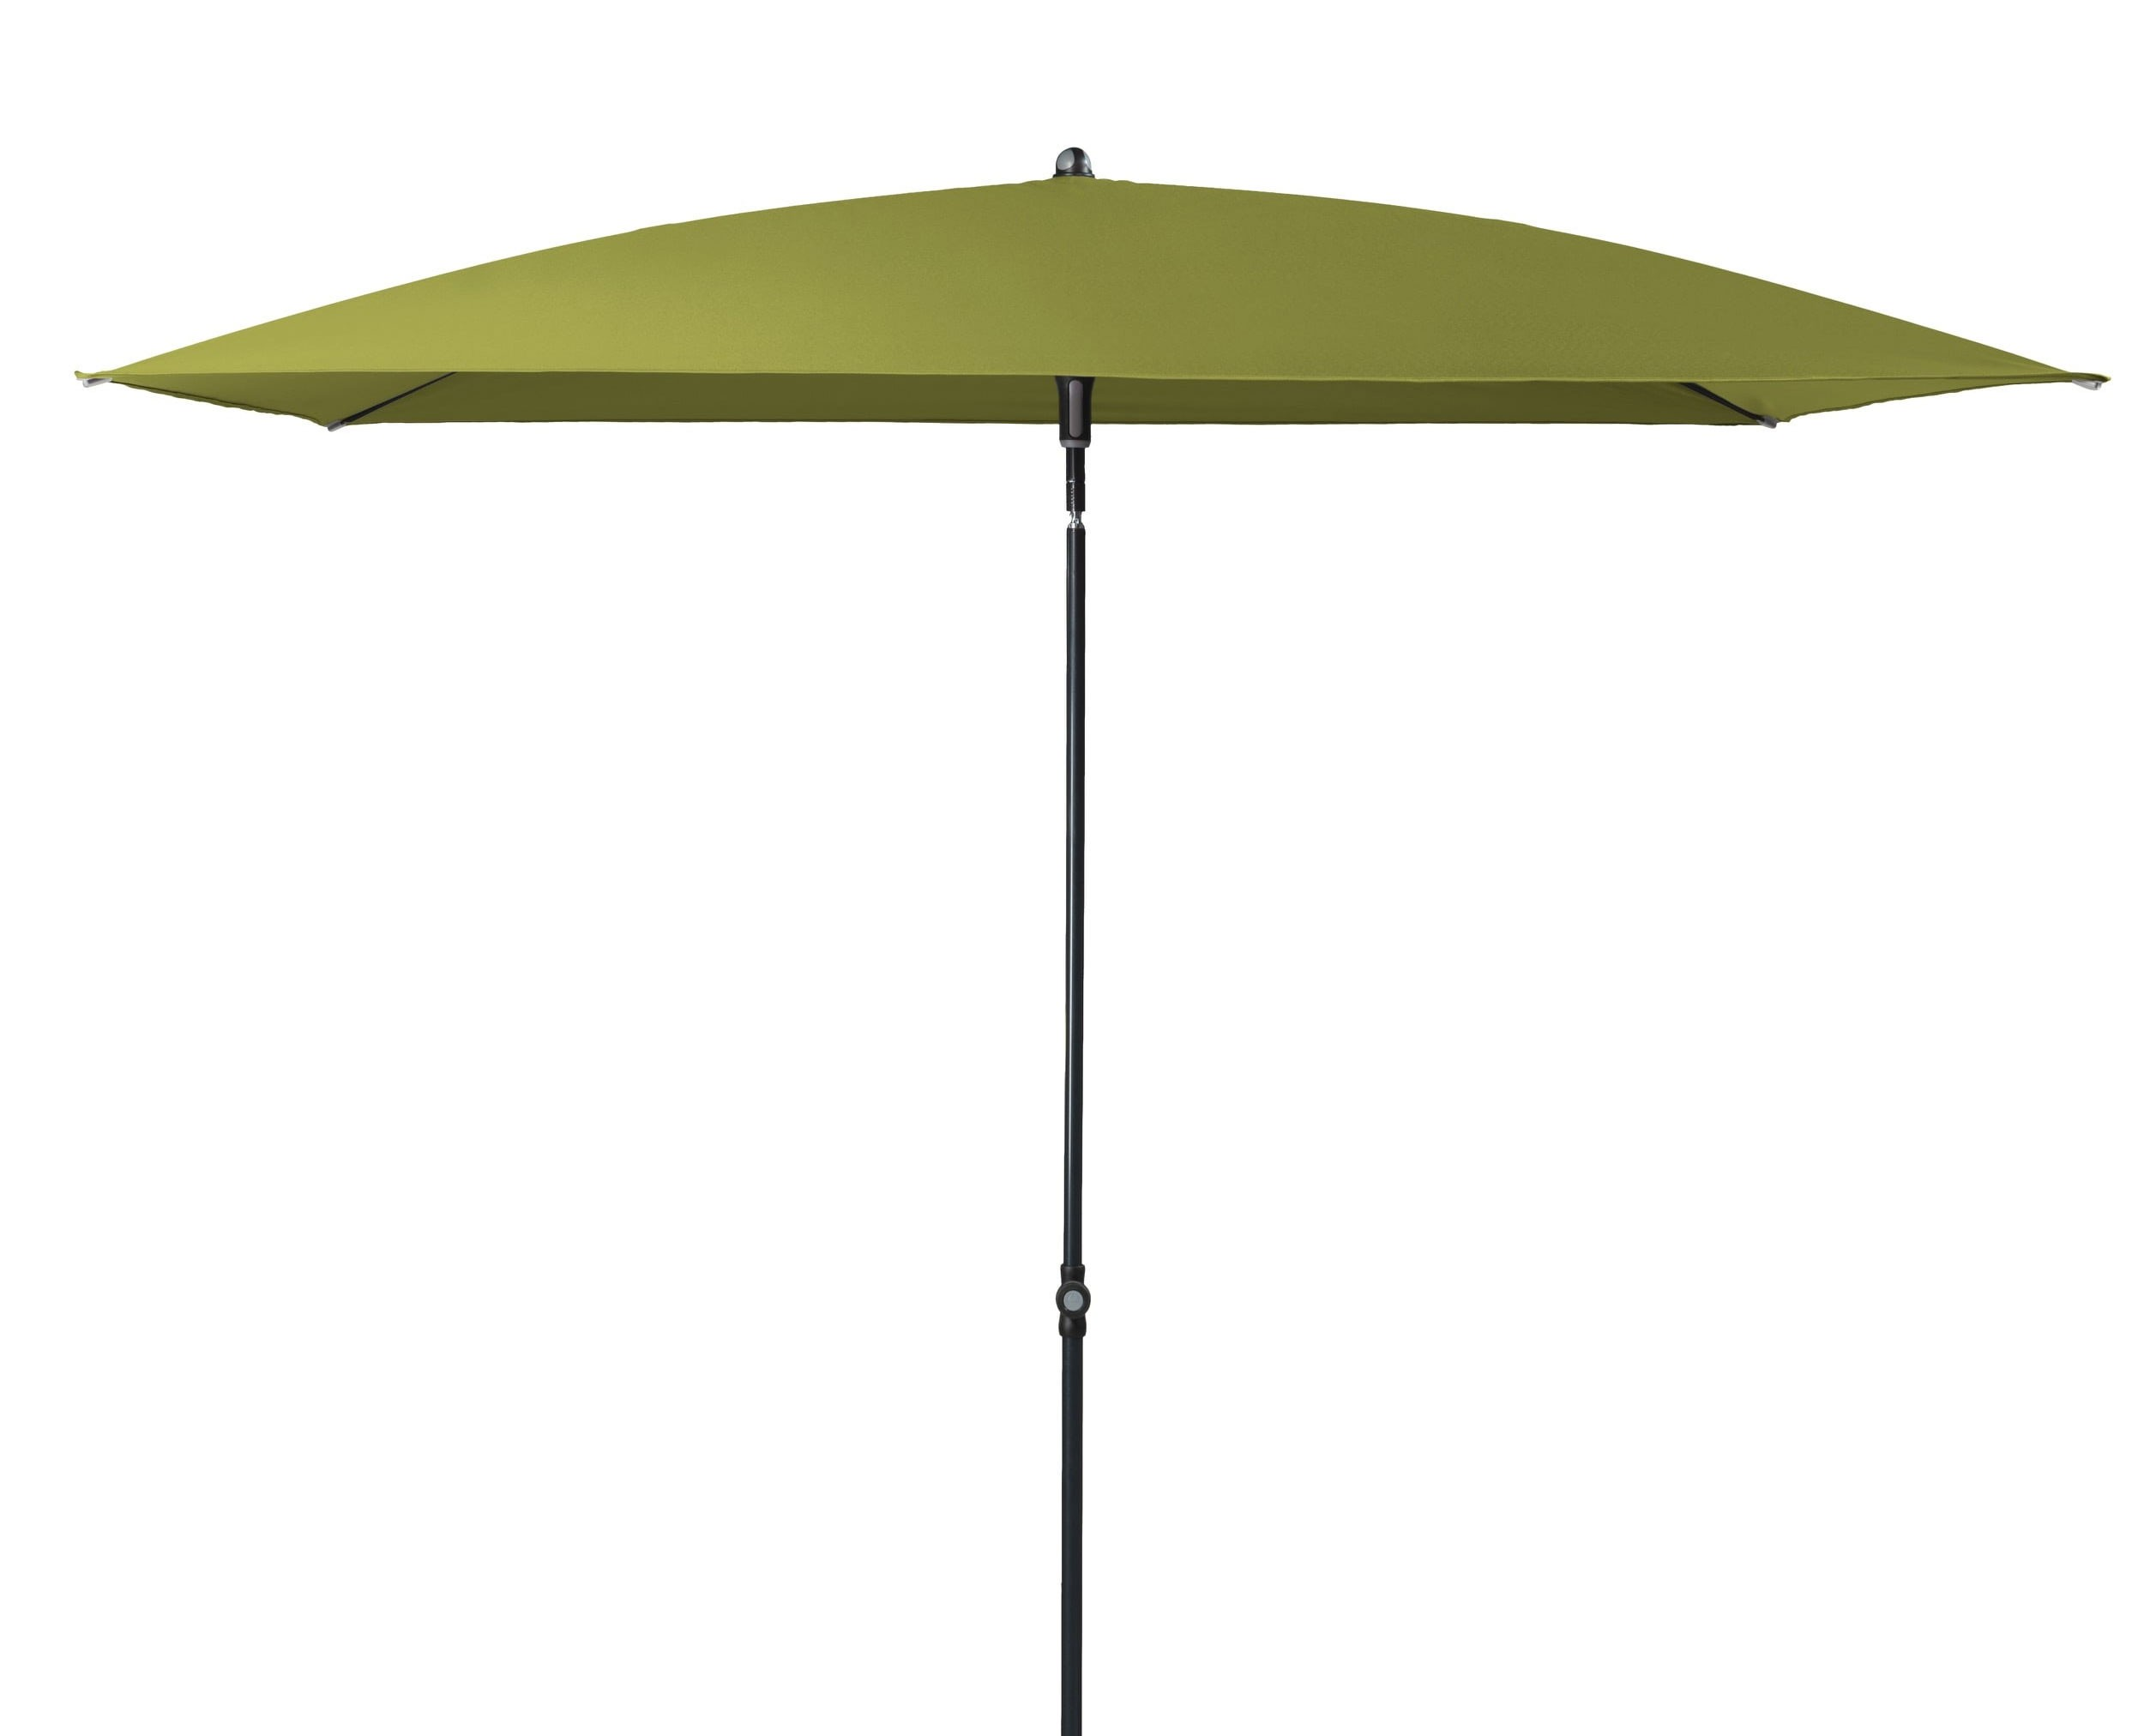 Sonnenschirm Doppler Sunline Waterproof Festzelt 230x190cm pistazie Bild 1